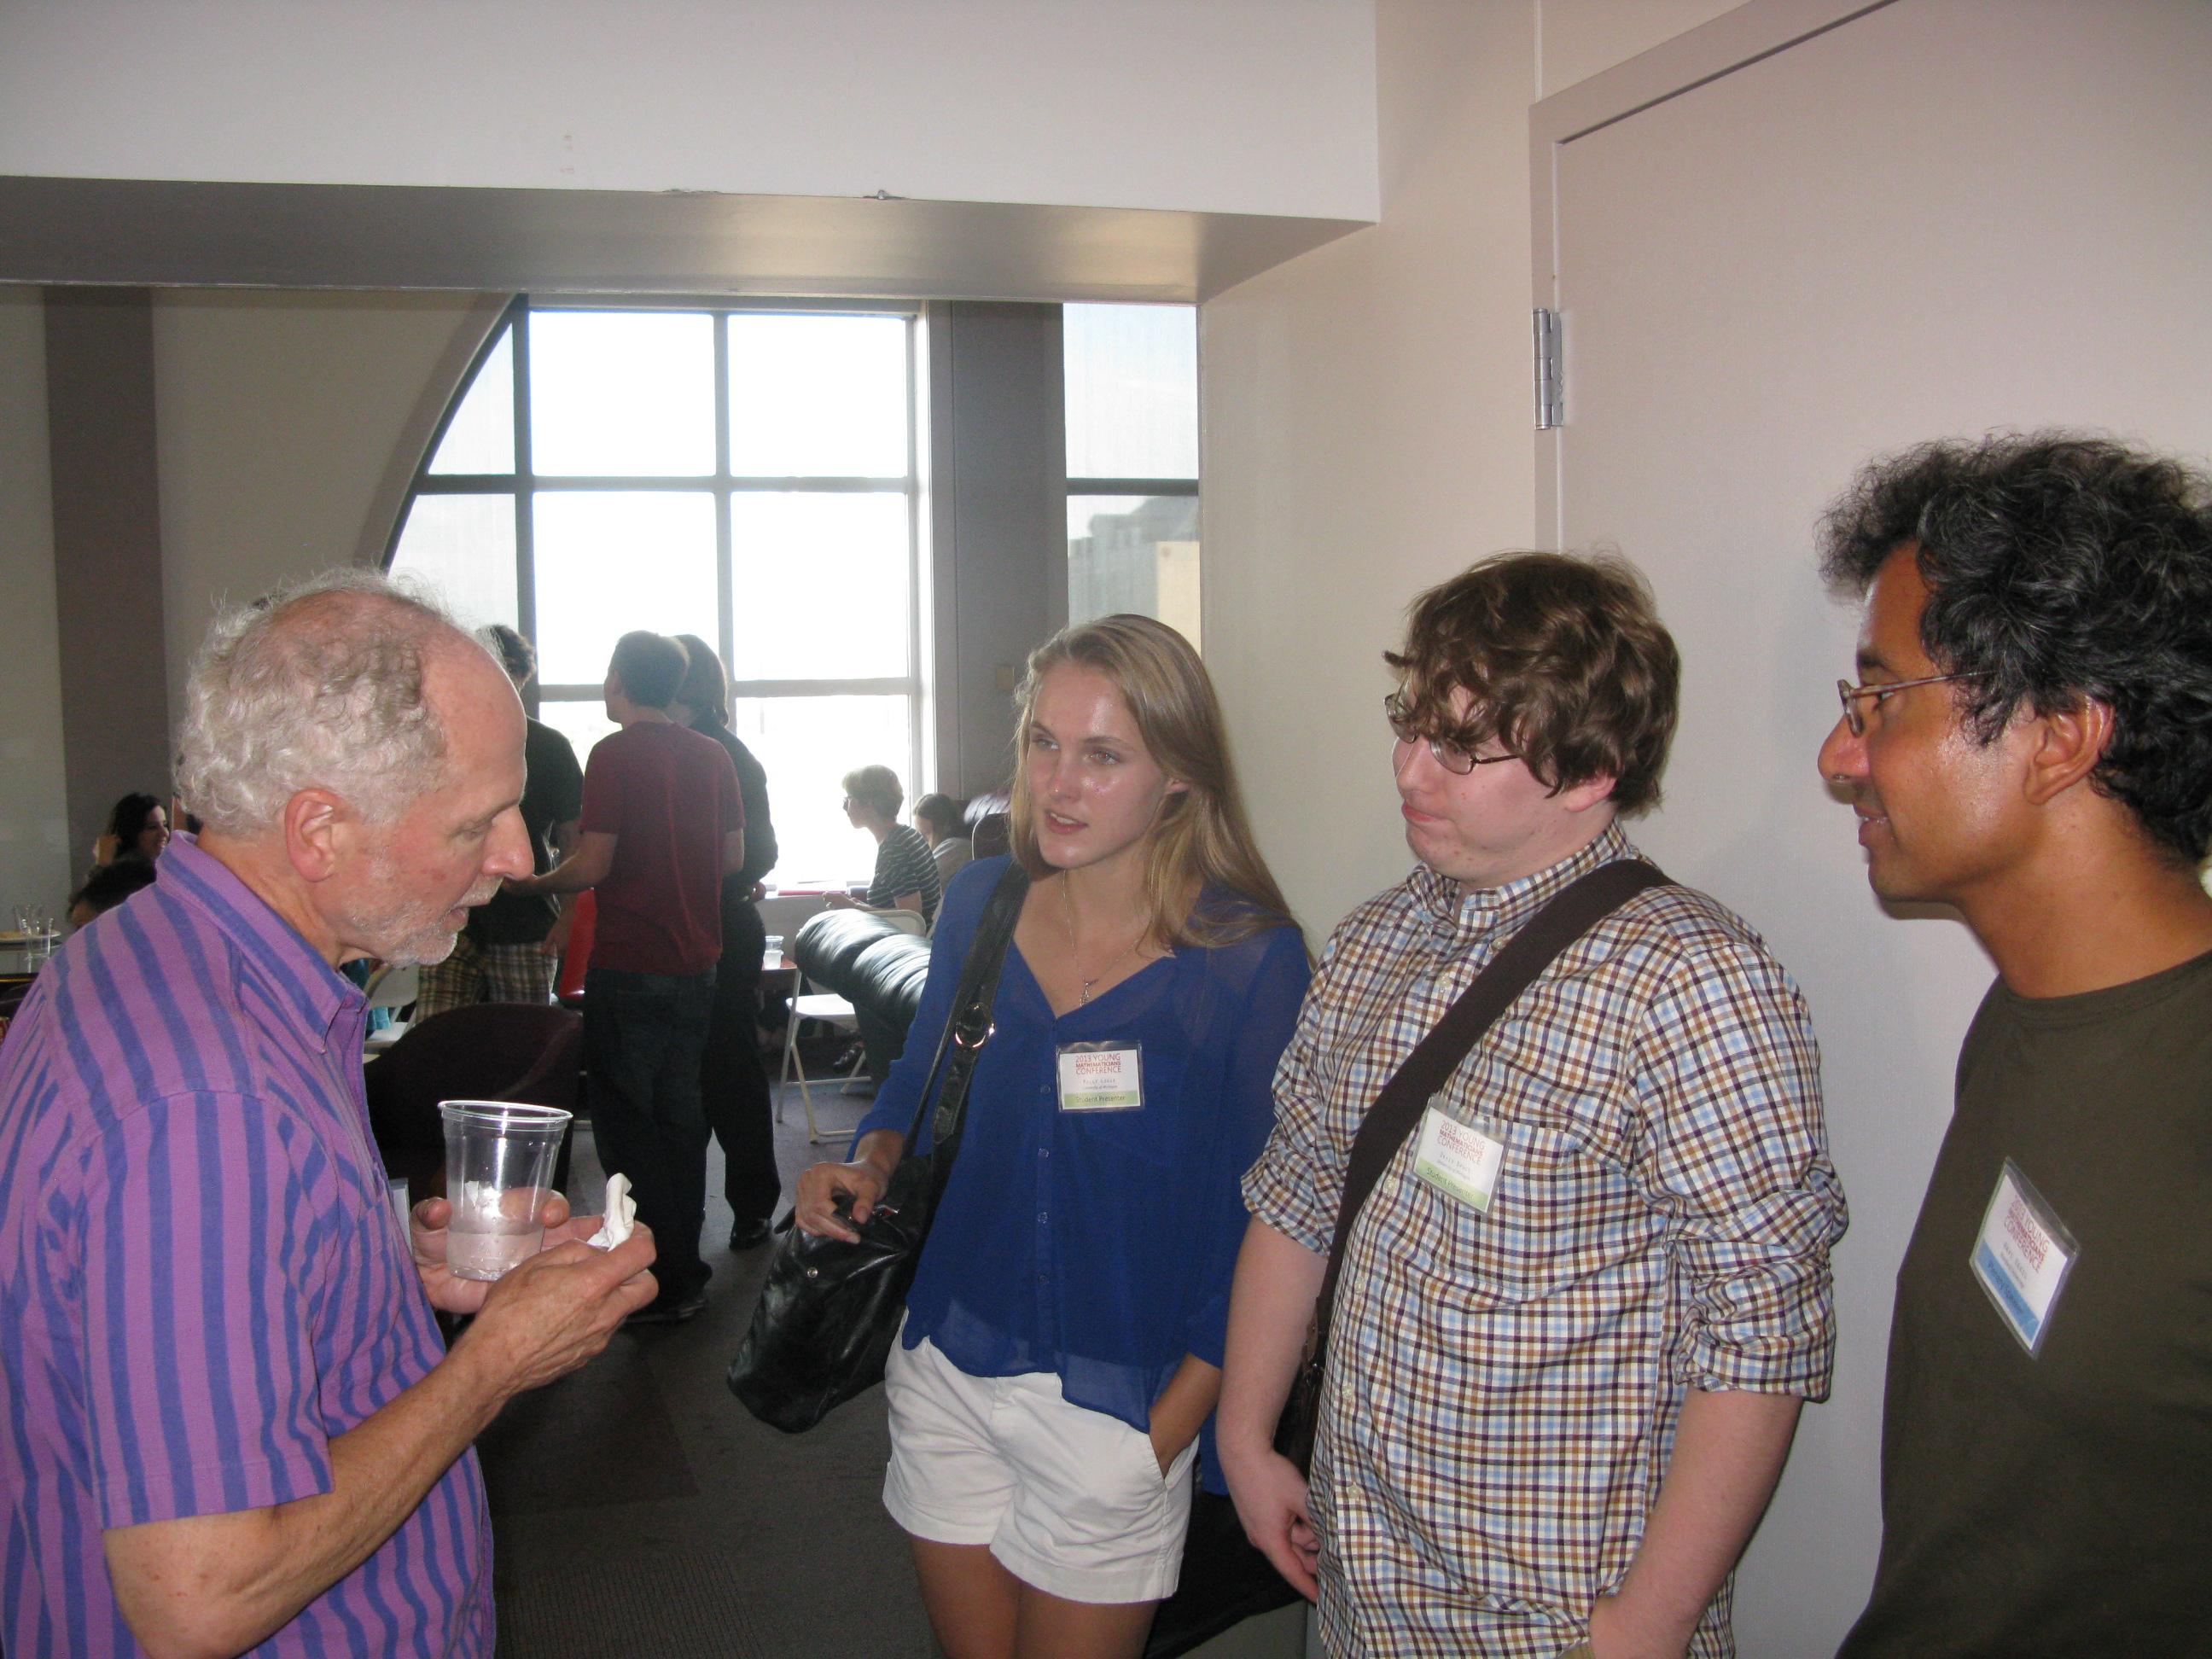 Instructors & students socializing.